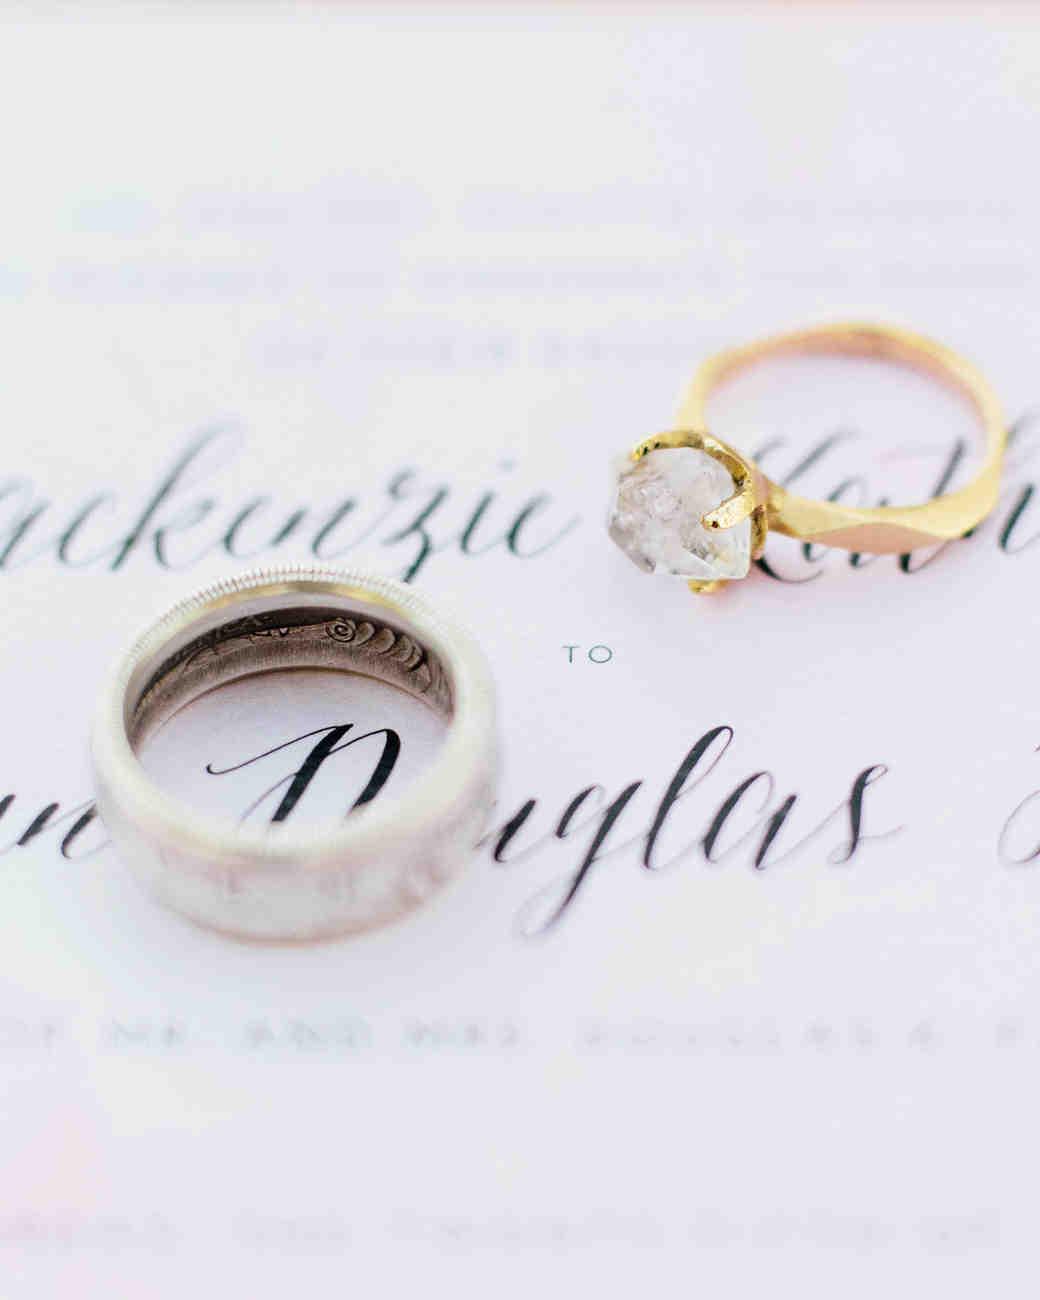 mackenzie-boman-wedding-rings-200-s112693-0316.jpg